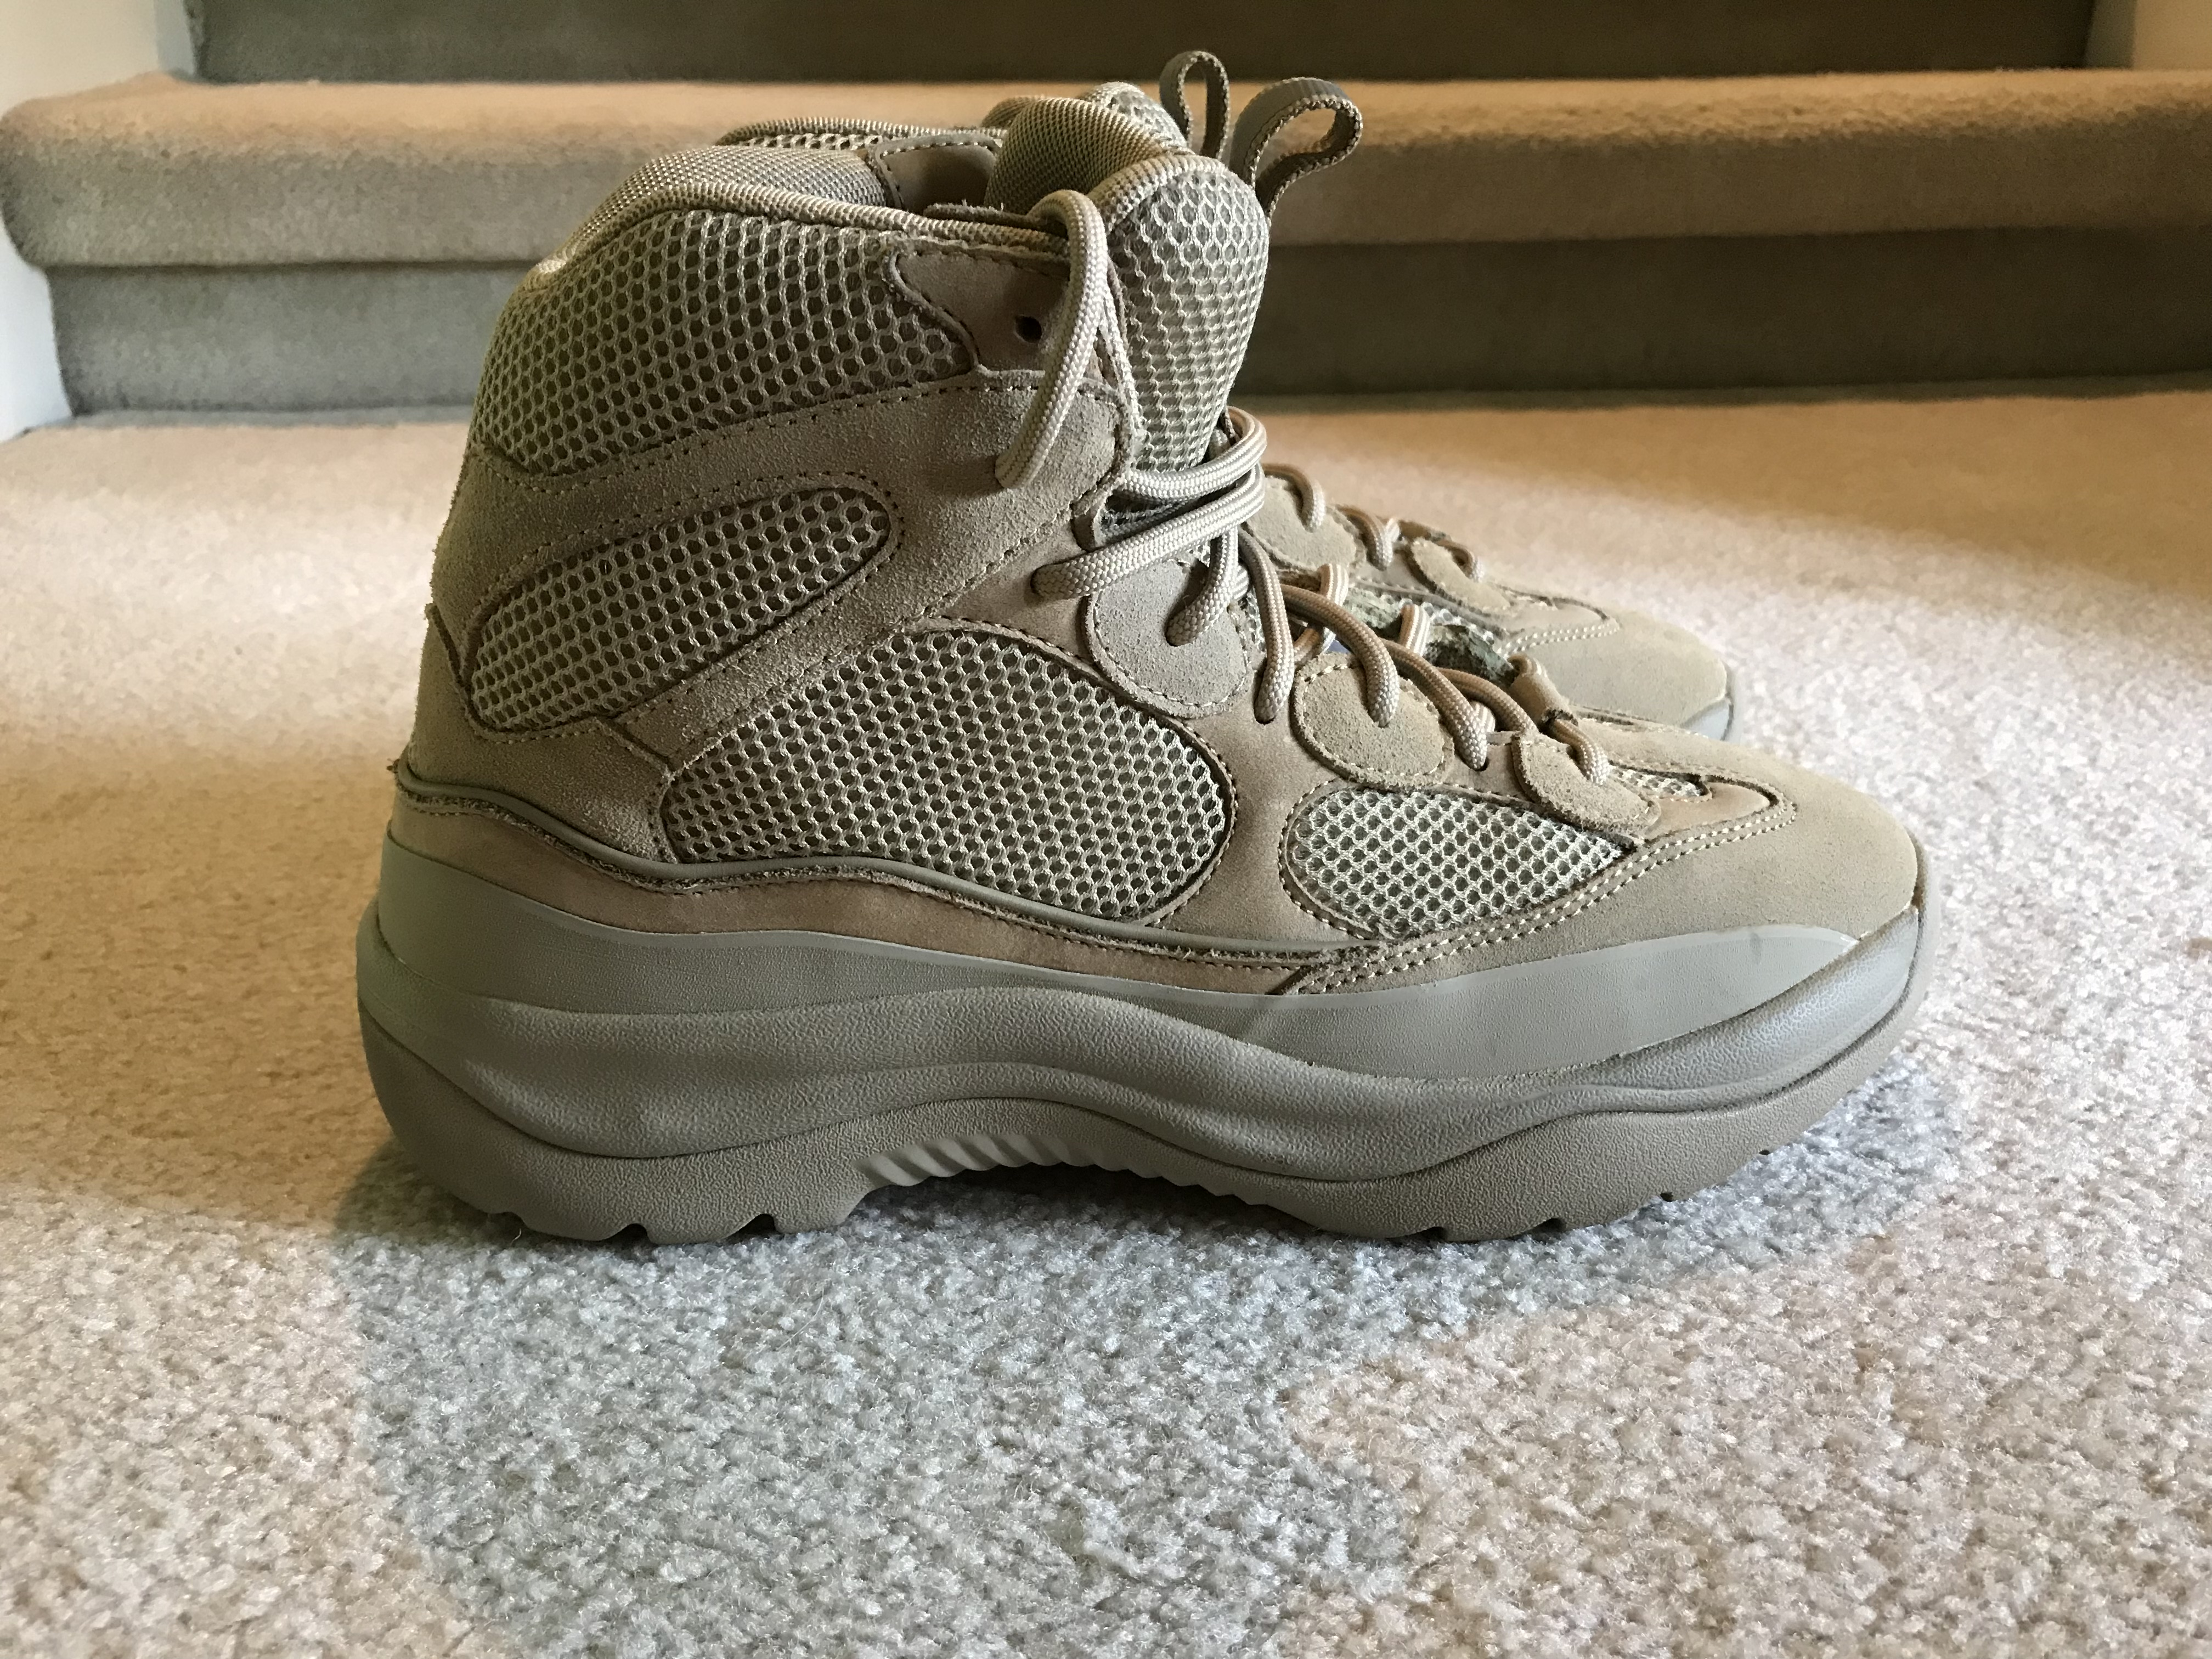 4fa056fd3e9fd ... Size Us 11. Yeezy Season 6 Desert Rat Boot Grailed. Yeezy Season Desert  Rat Boots Graphite ...